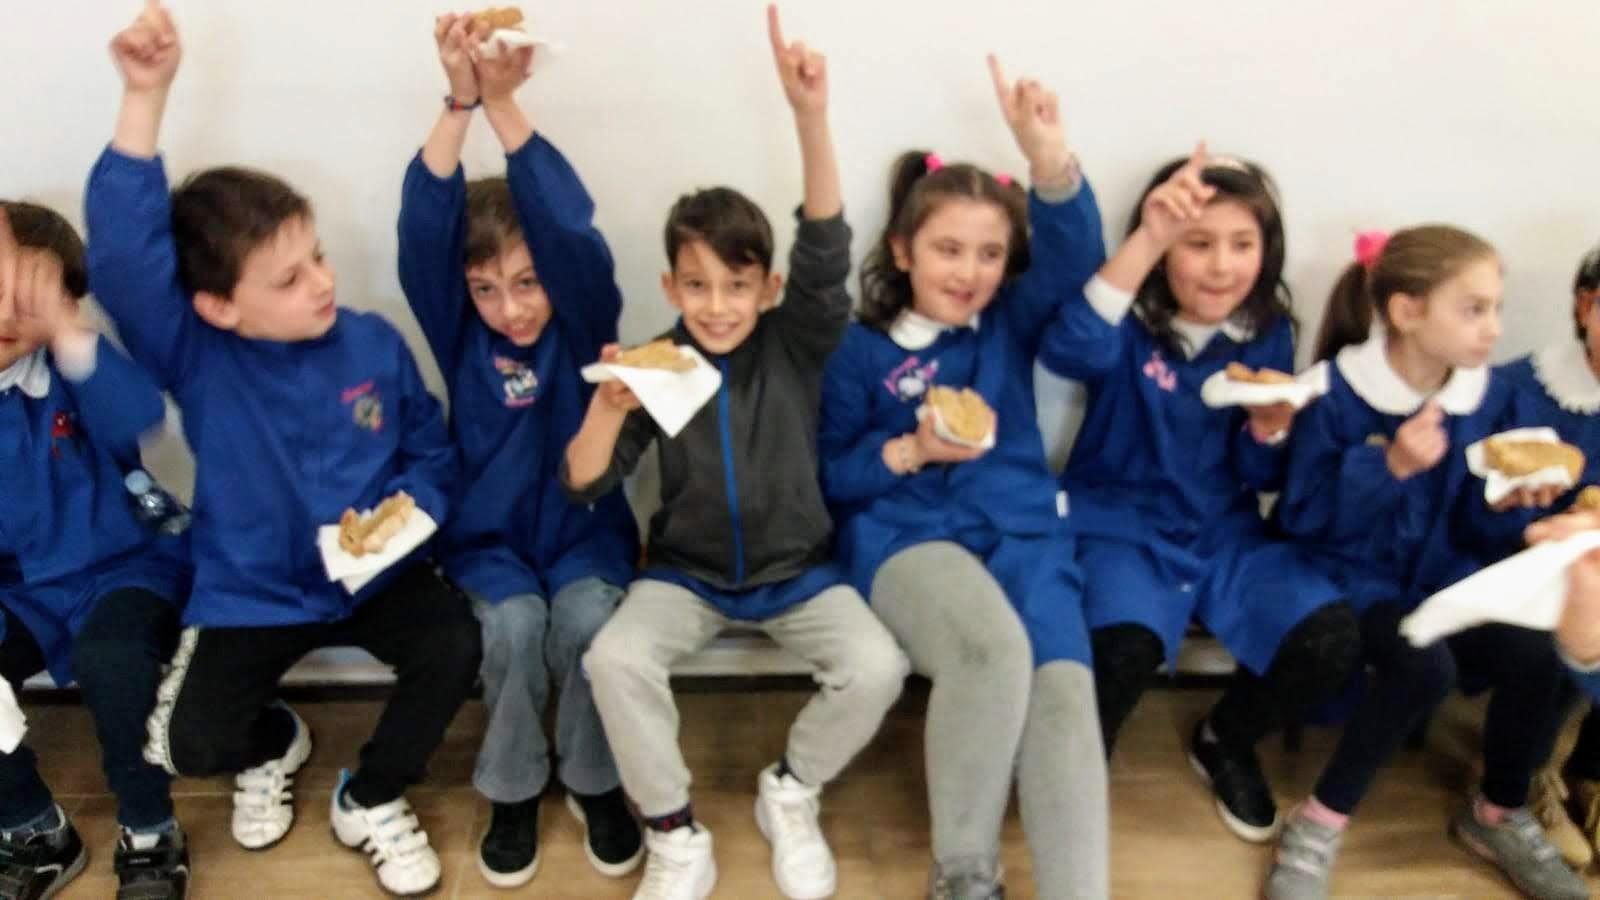 Pane e olio merenda sana a scuola